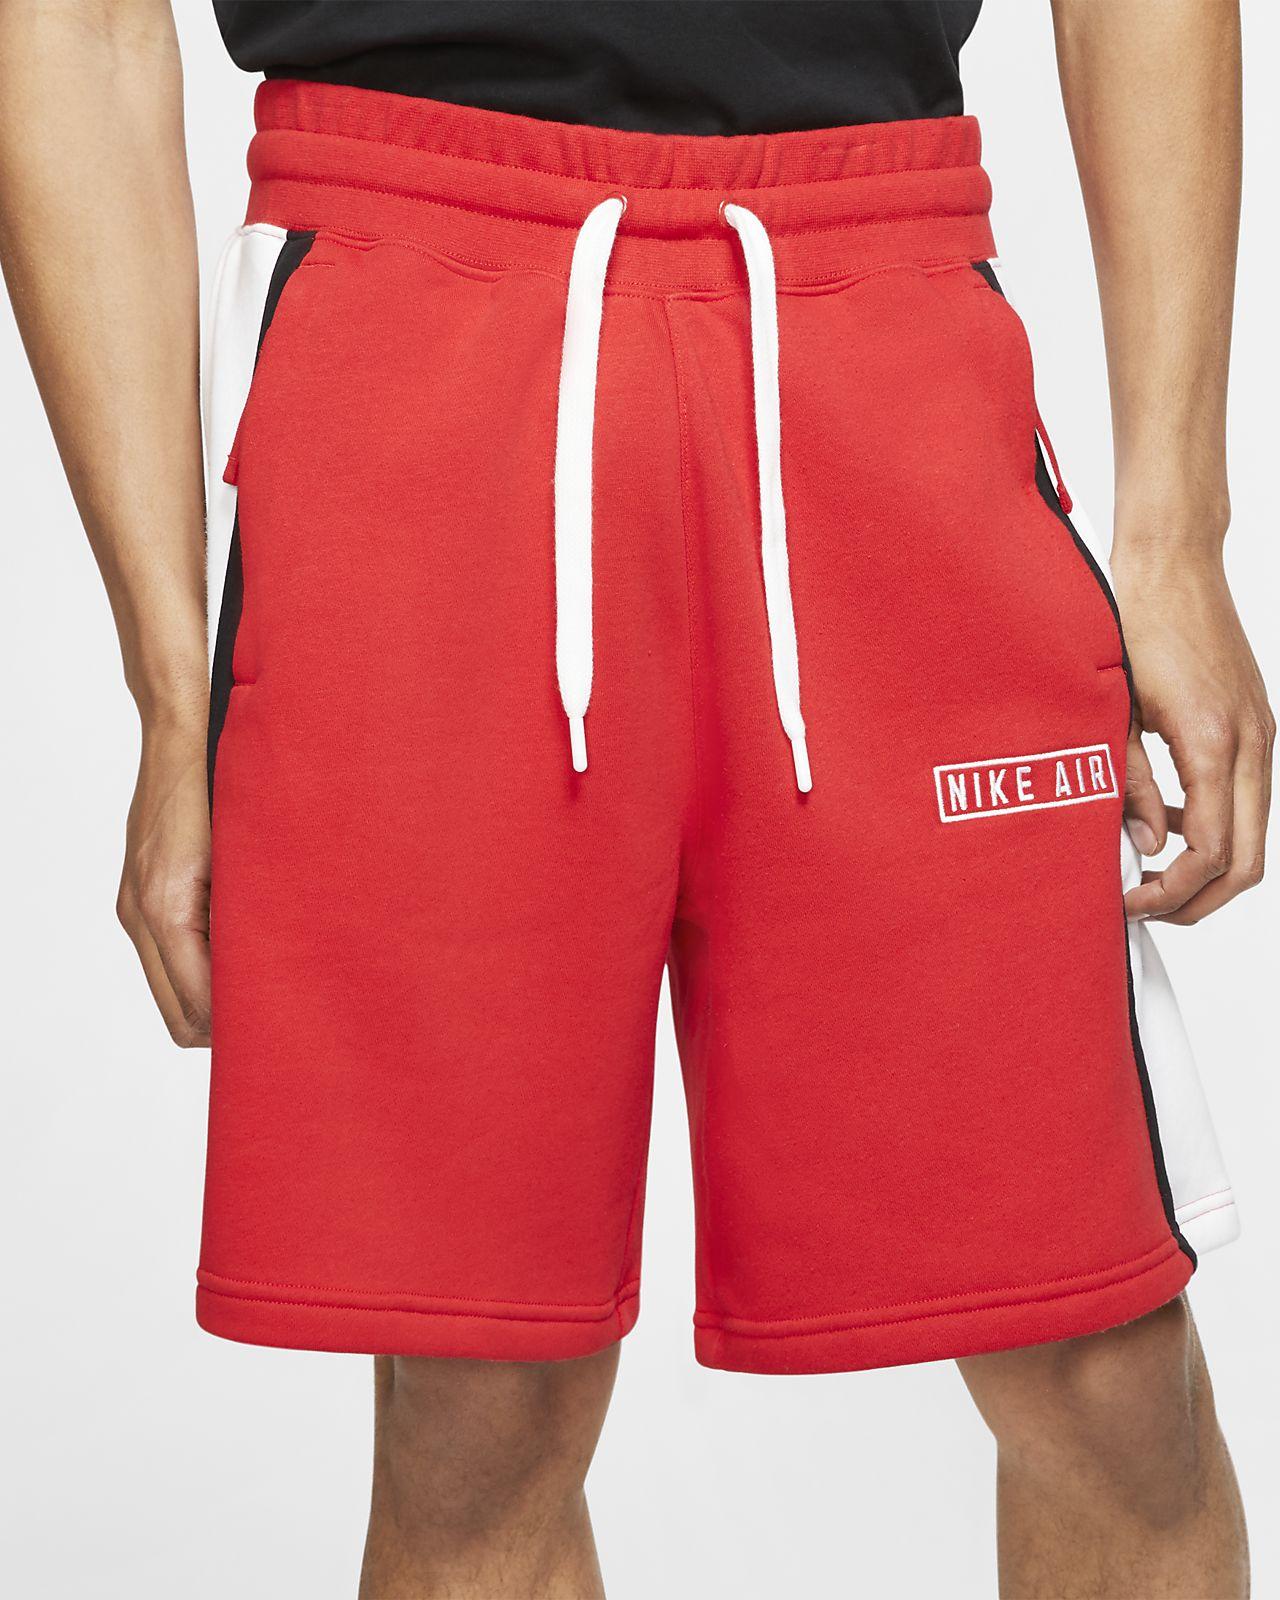 Nike Air Herenshorts